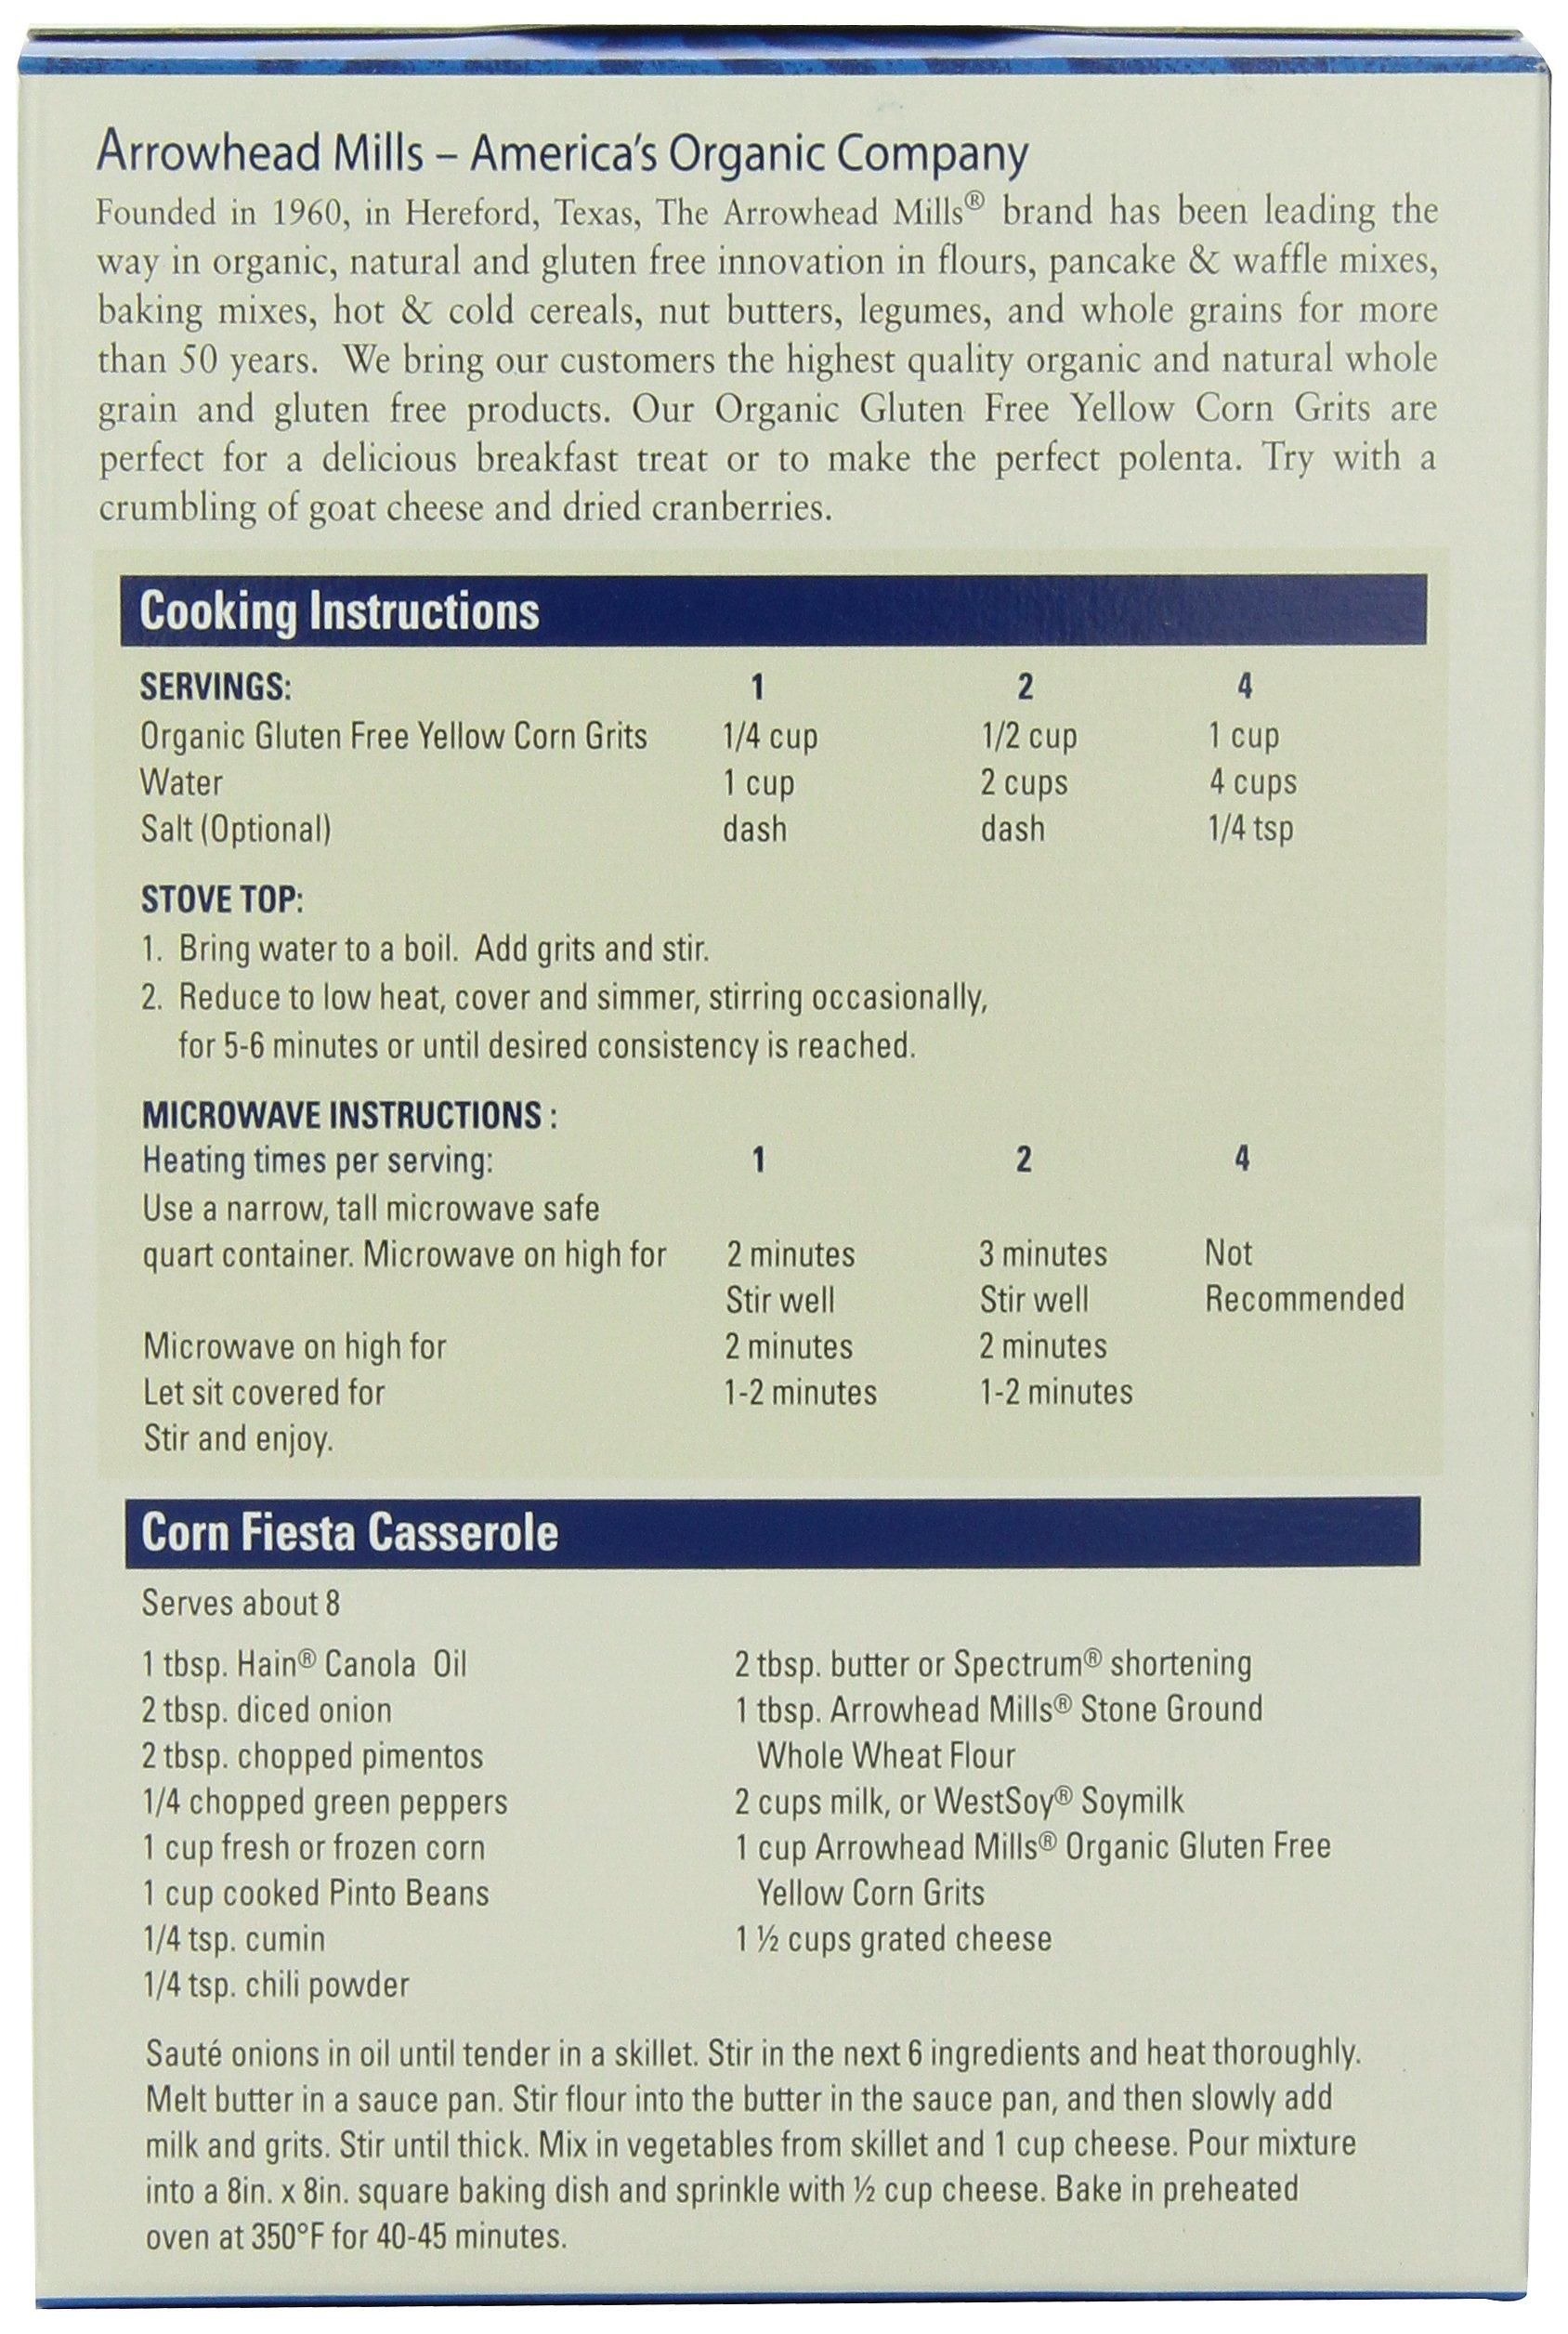 Arrowhead Mills Organic Gluten-Free Yellow Corn Grits, 24 oz. Bag (Pack of 6) by Arrowhead Mills (Image #5)